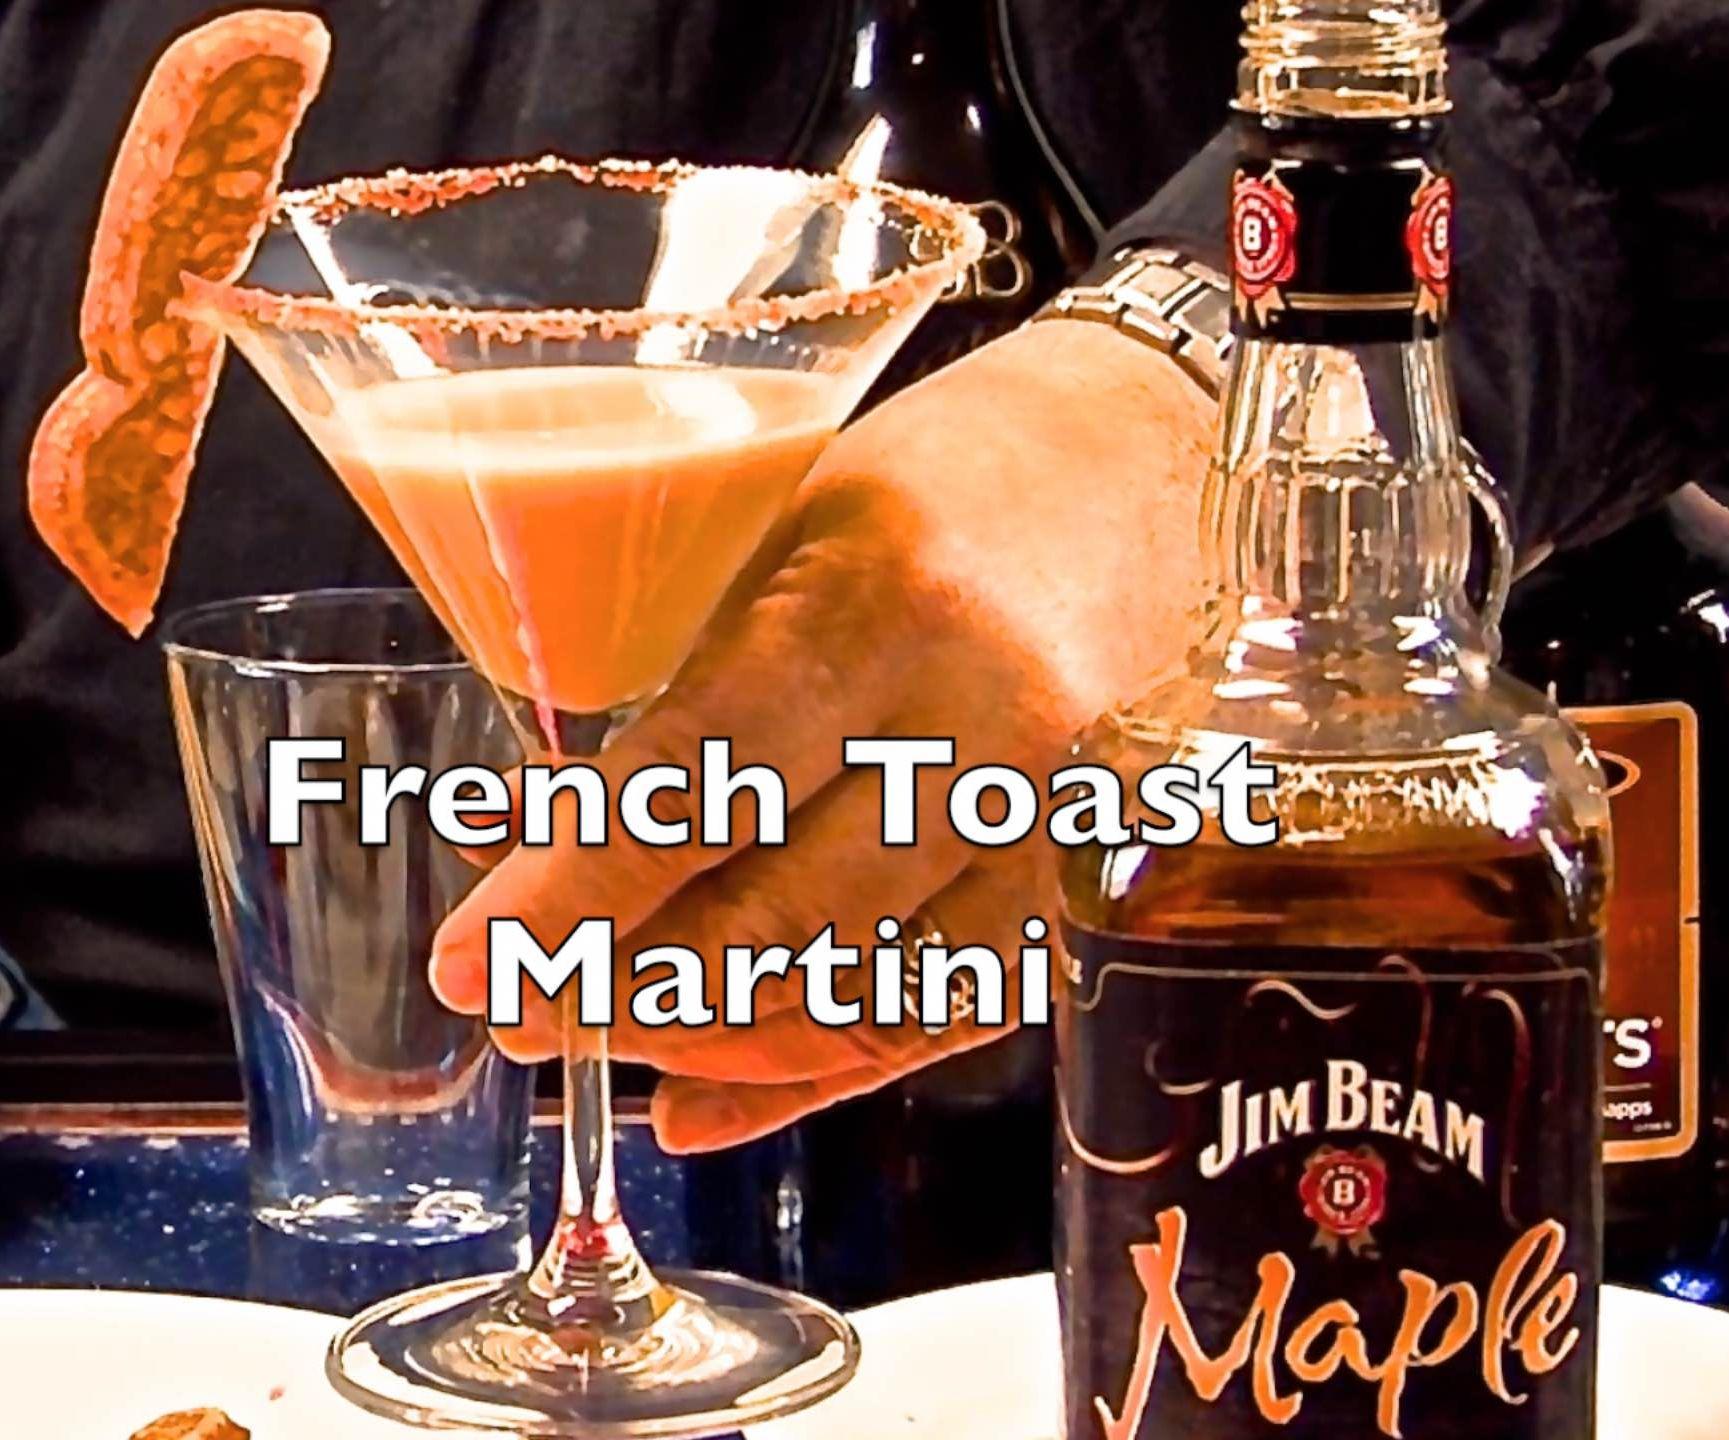 Yummy French Toast Martini